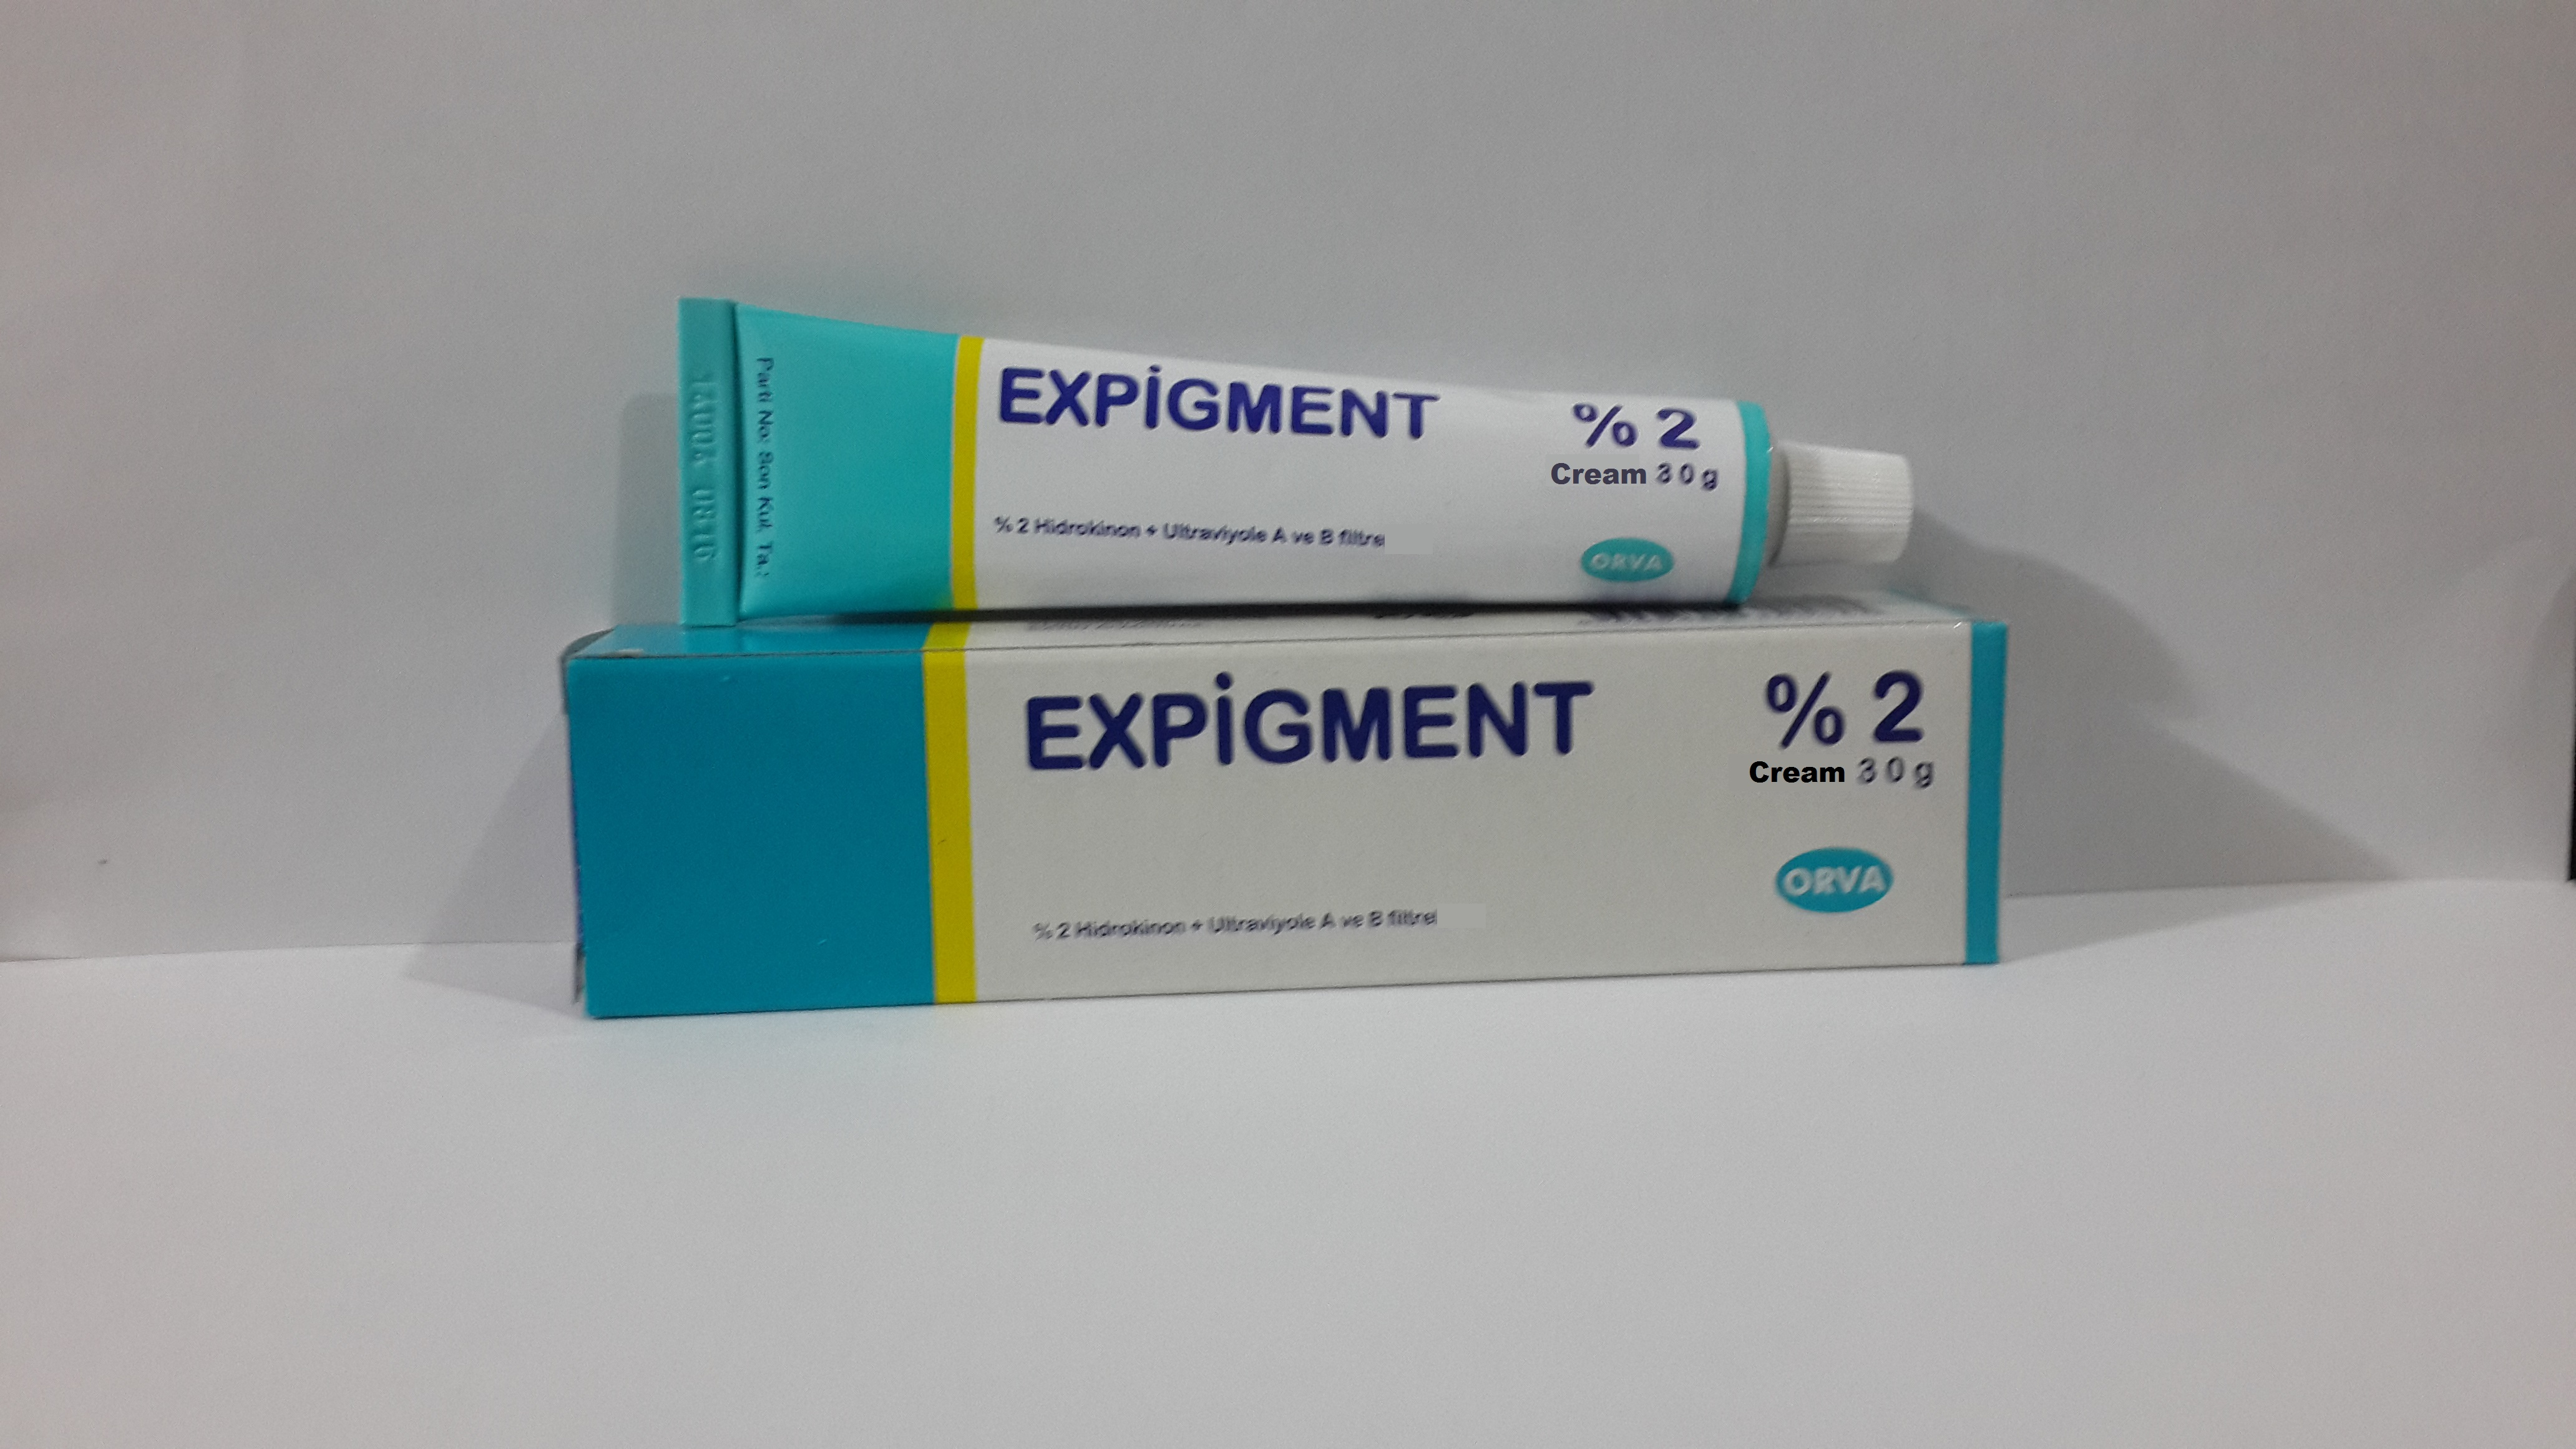 Expigment Hydroquinone 2% Cream For Skin Bleaching Skin Lightening Skin Melasma Treatment 30g/1oz